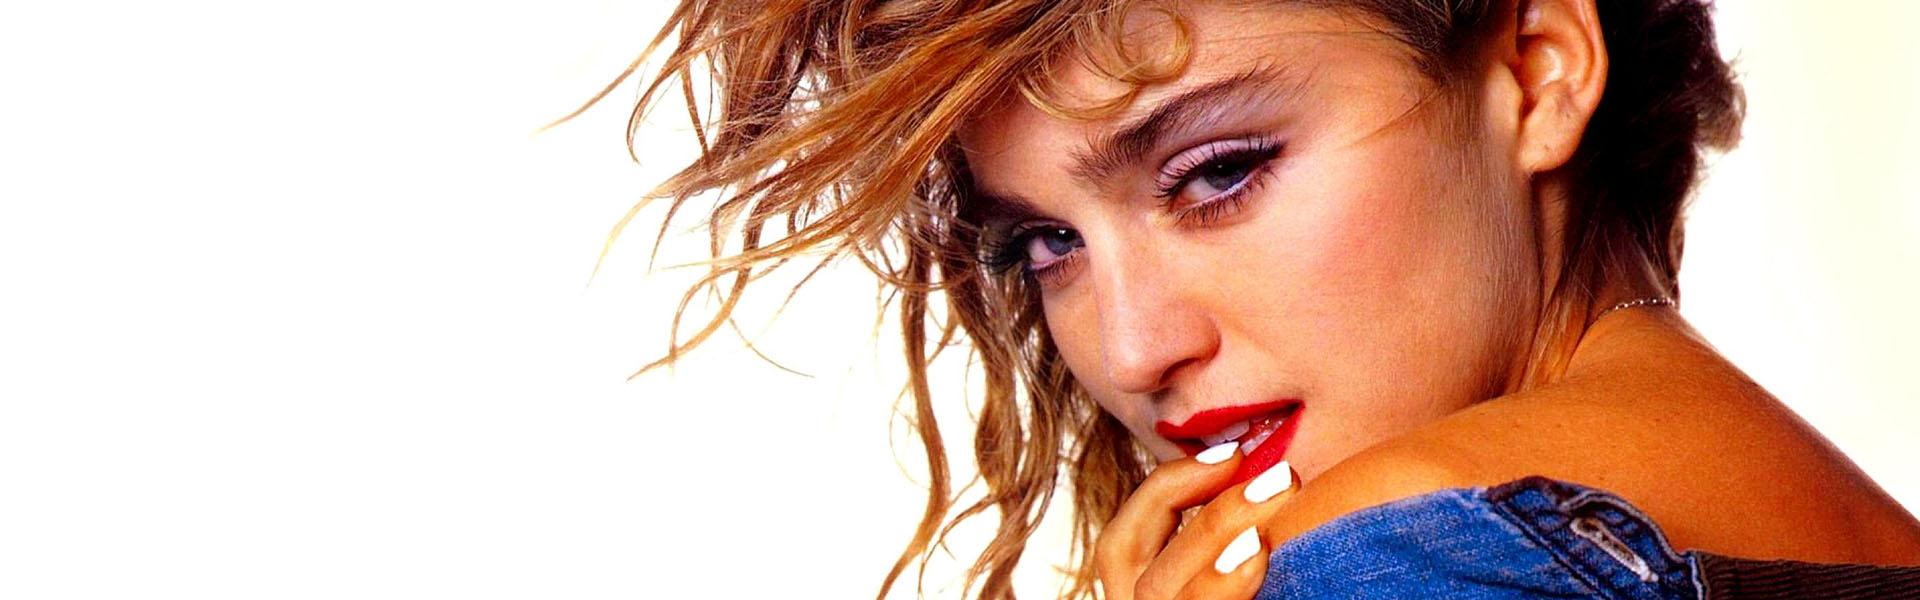 Madonna facebook